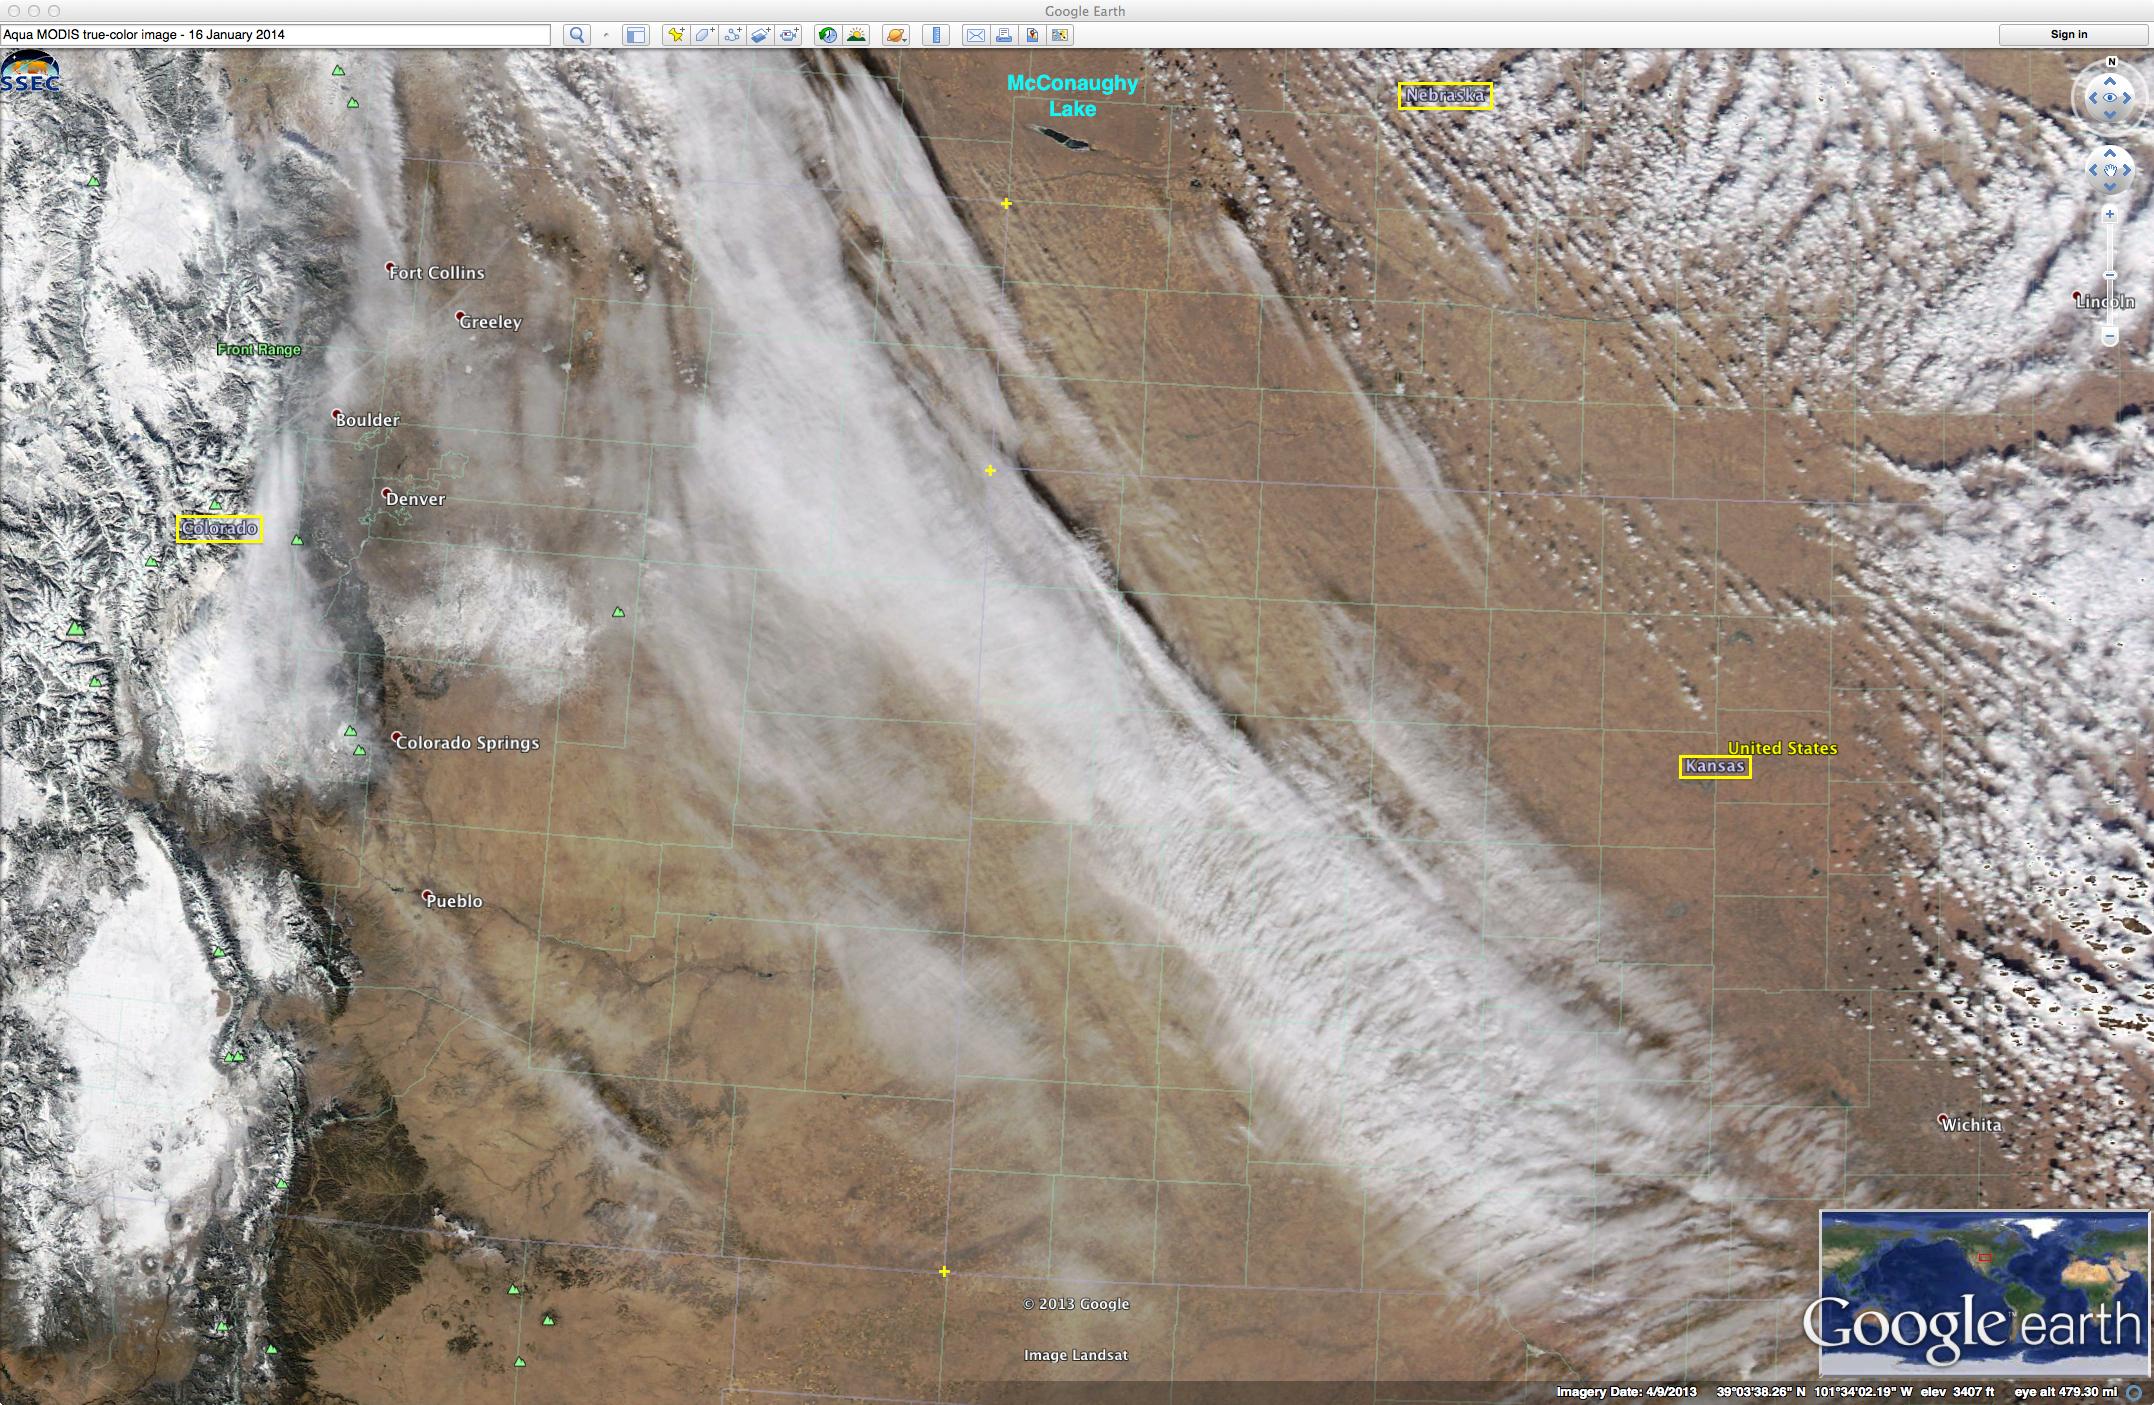 Aqua MODIS true-color RGB image (viewed using Google Earth)